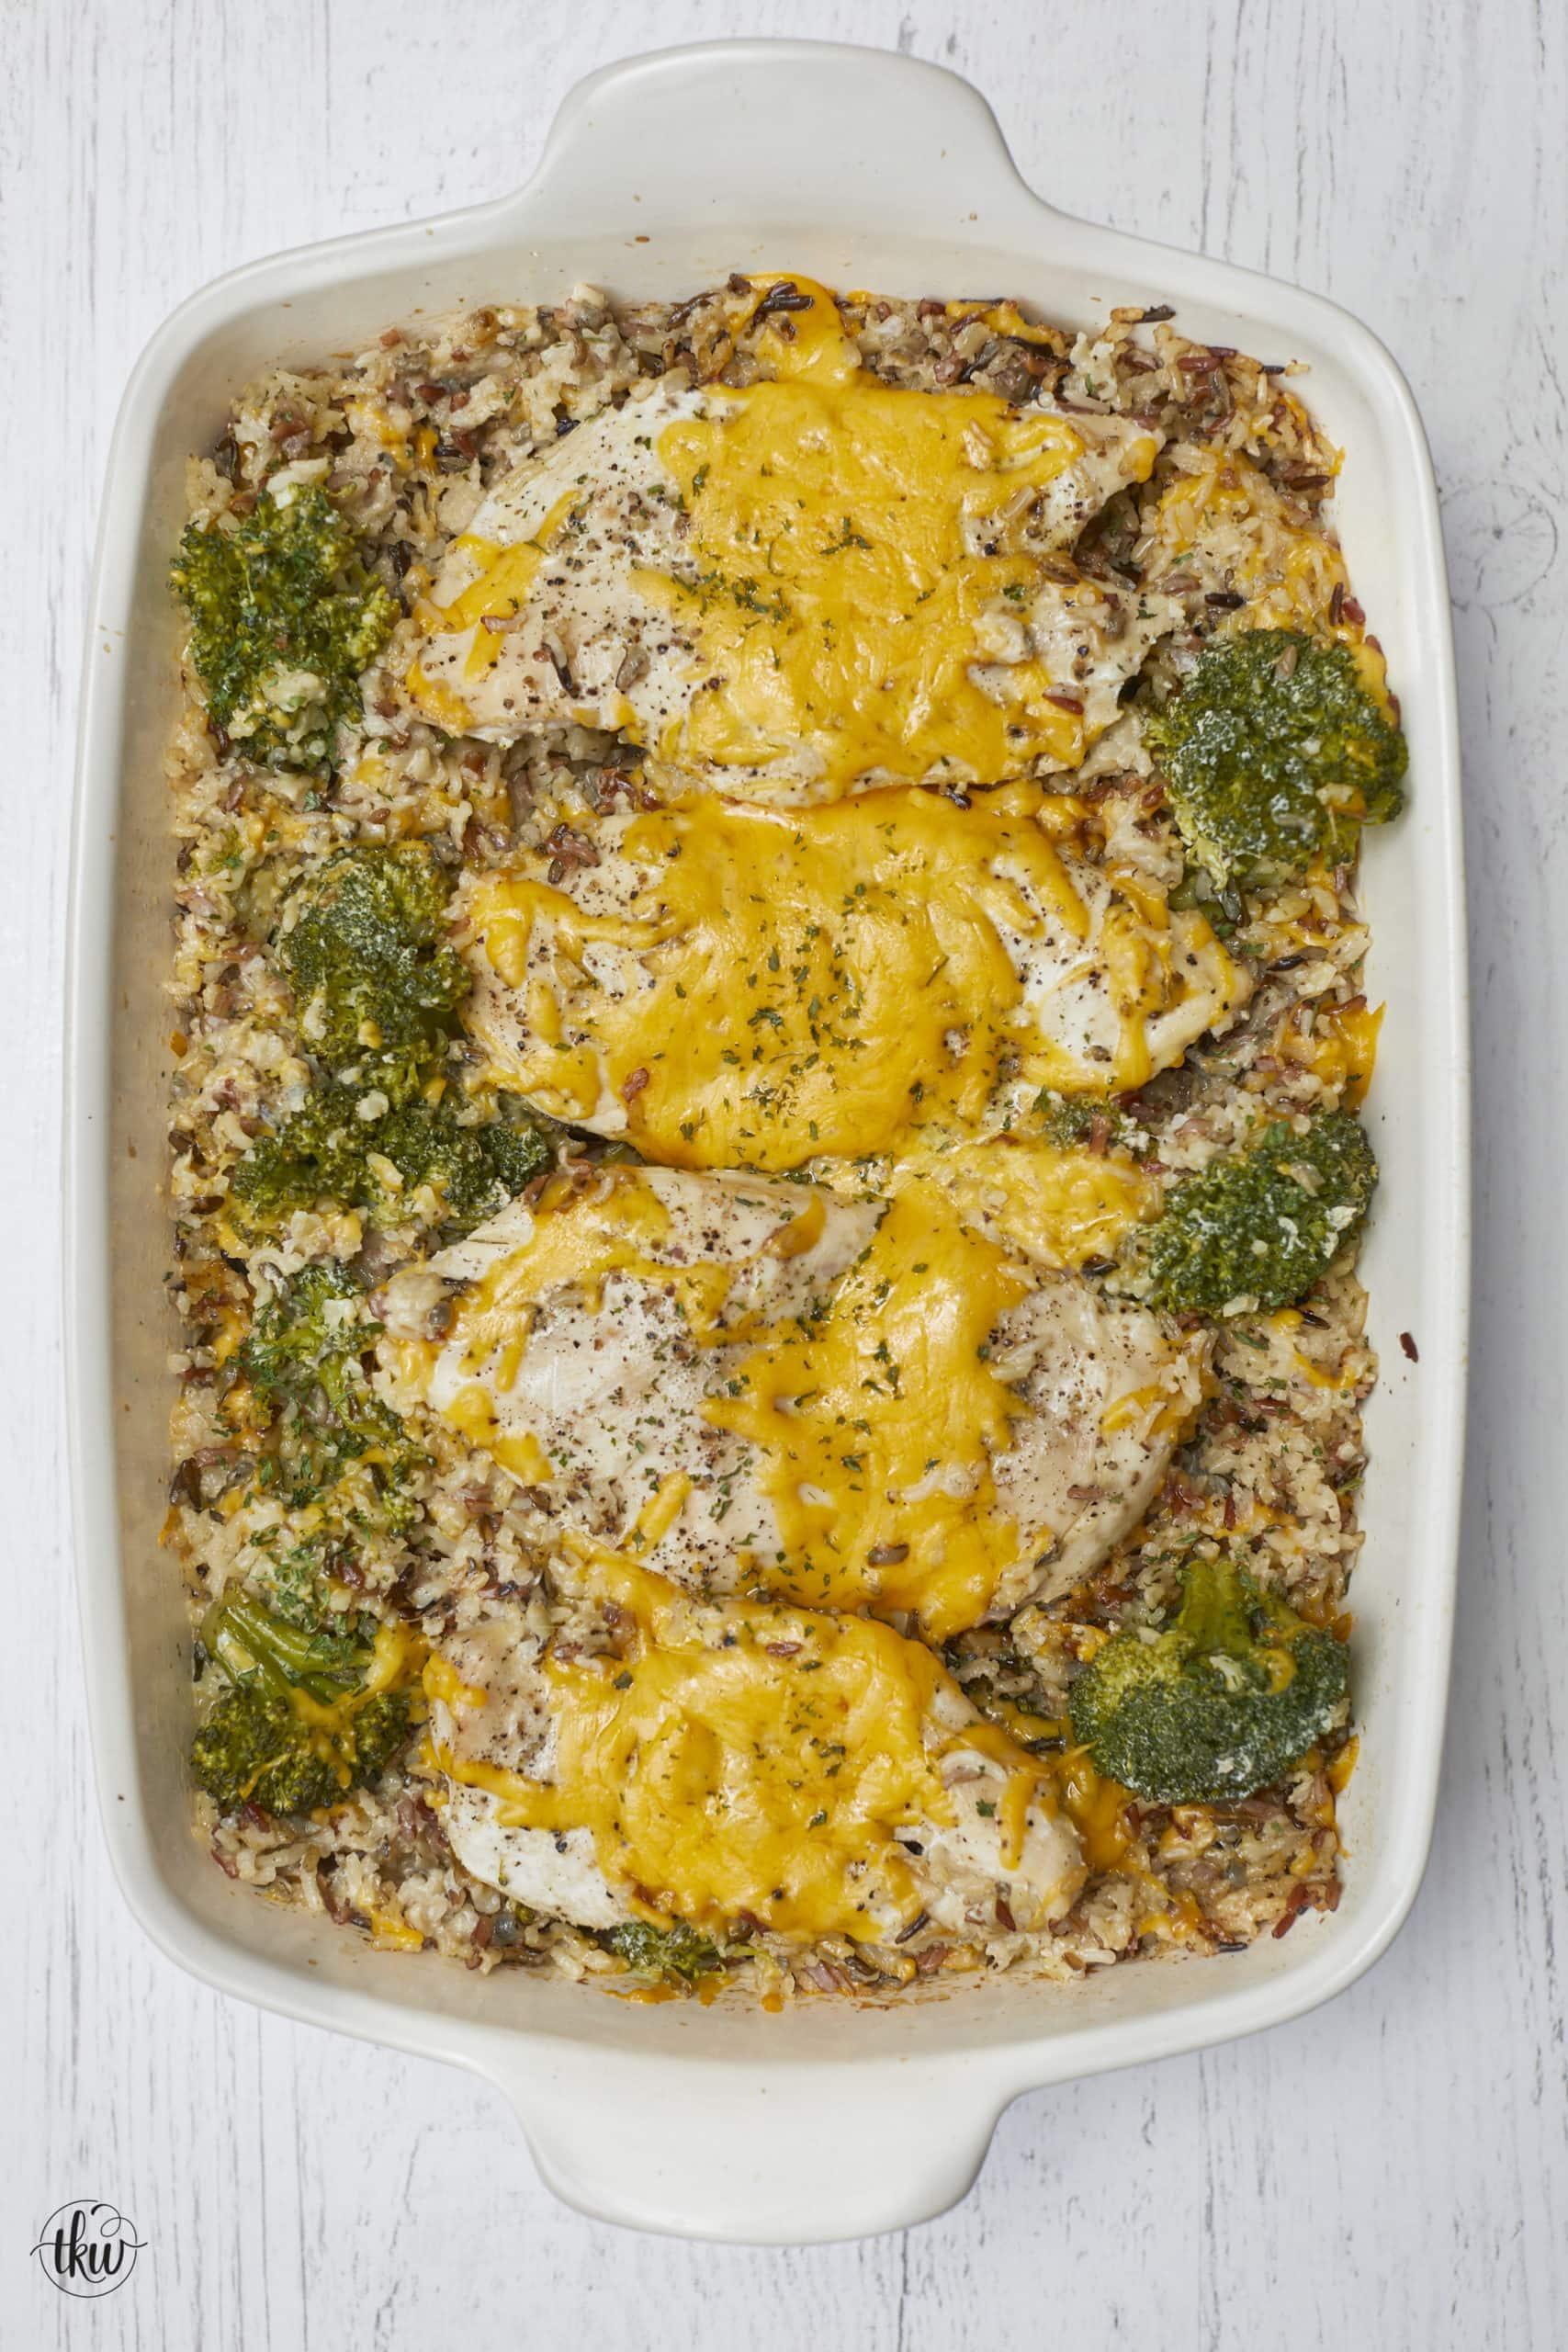 Baked Cheesy Chicken & Broccoli Wild Rice Blend Casserole